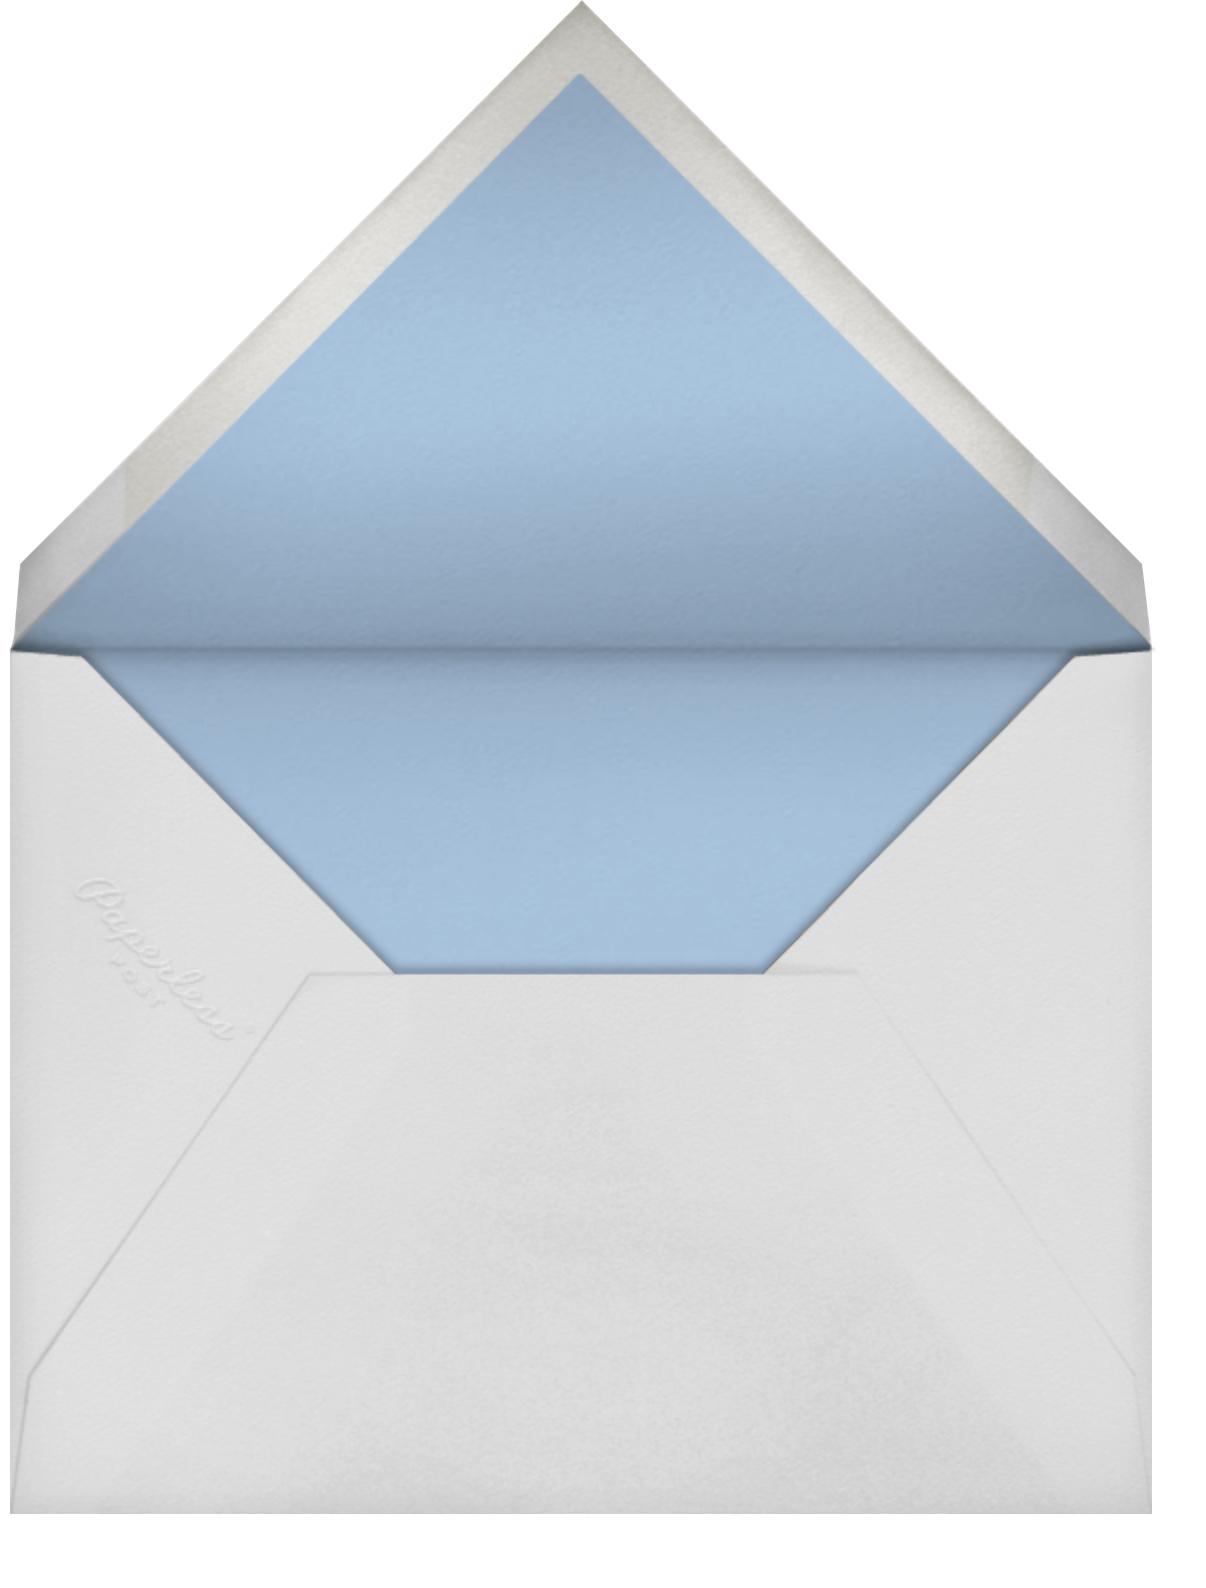 Falling Flowers - Navy - kate spade new york - Envelope